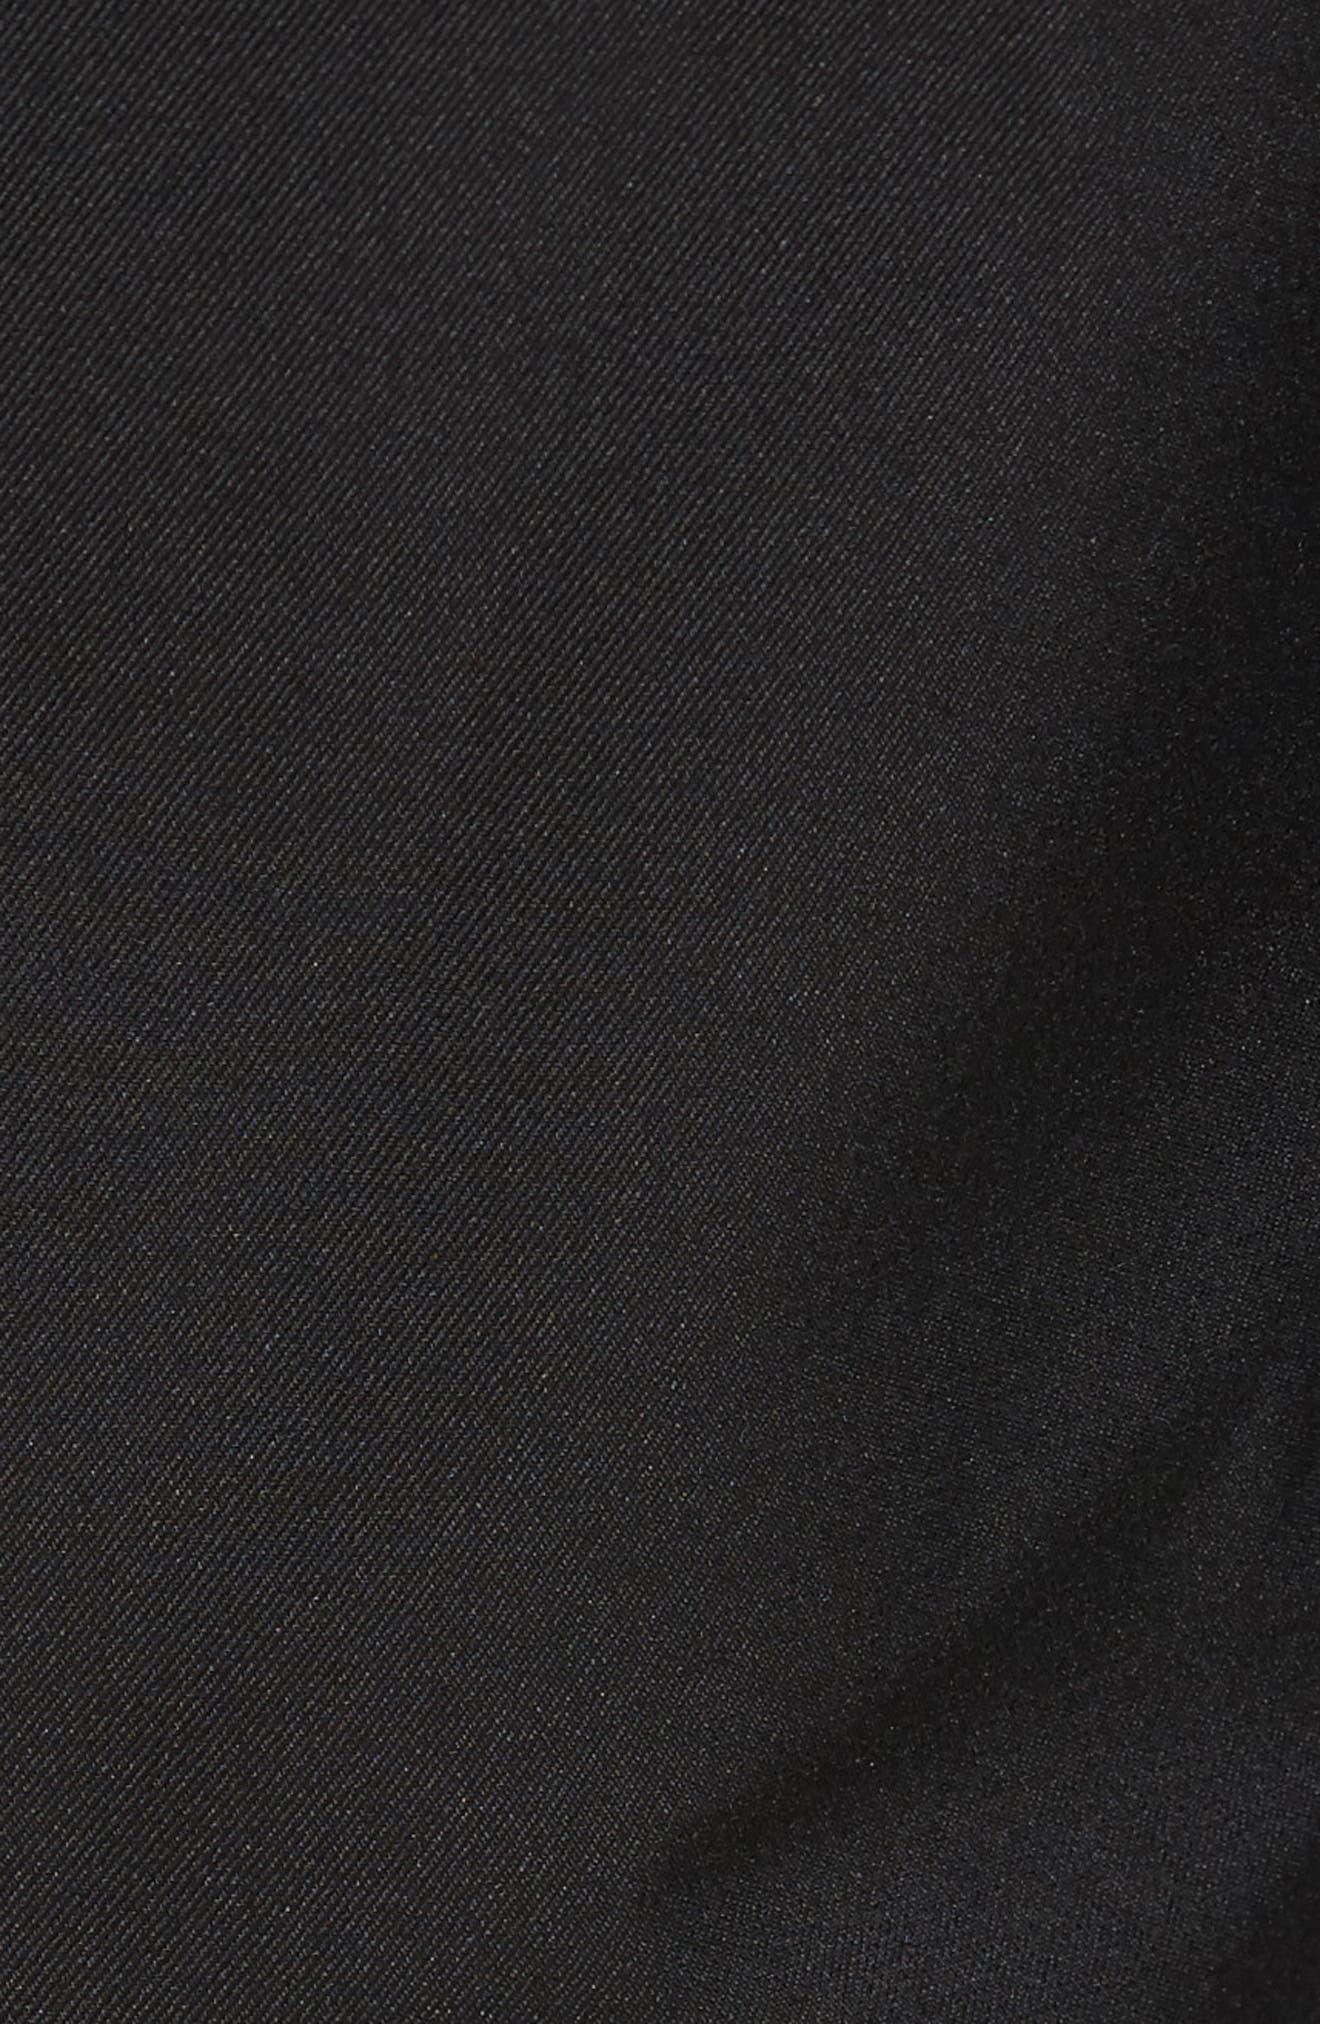 'Salem' Flat Front PerformanceShorts,                             Alternate thumbnail 5, color,                             Black